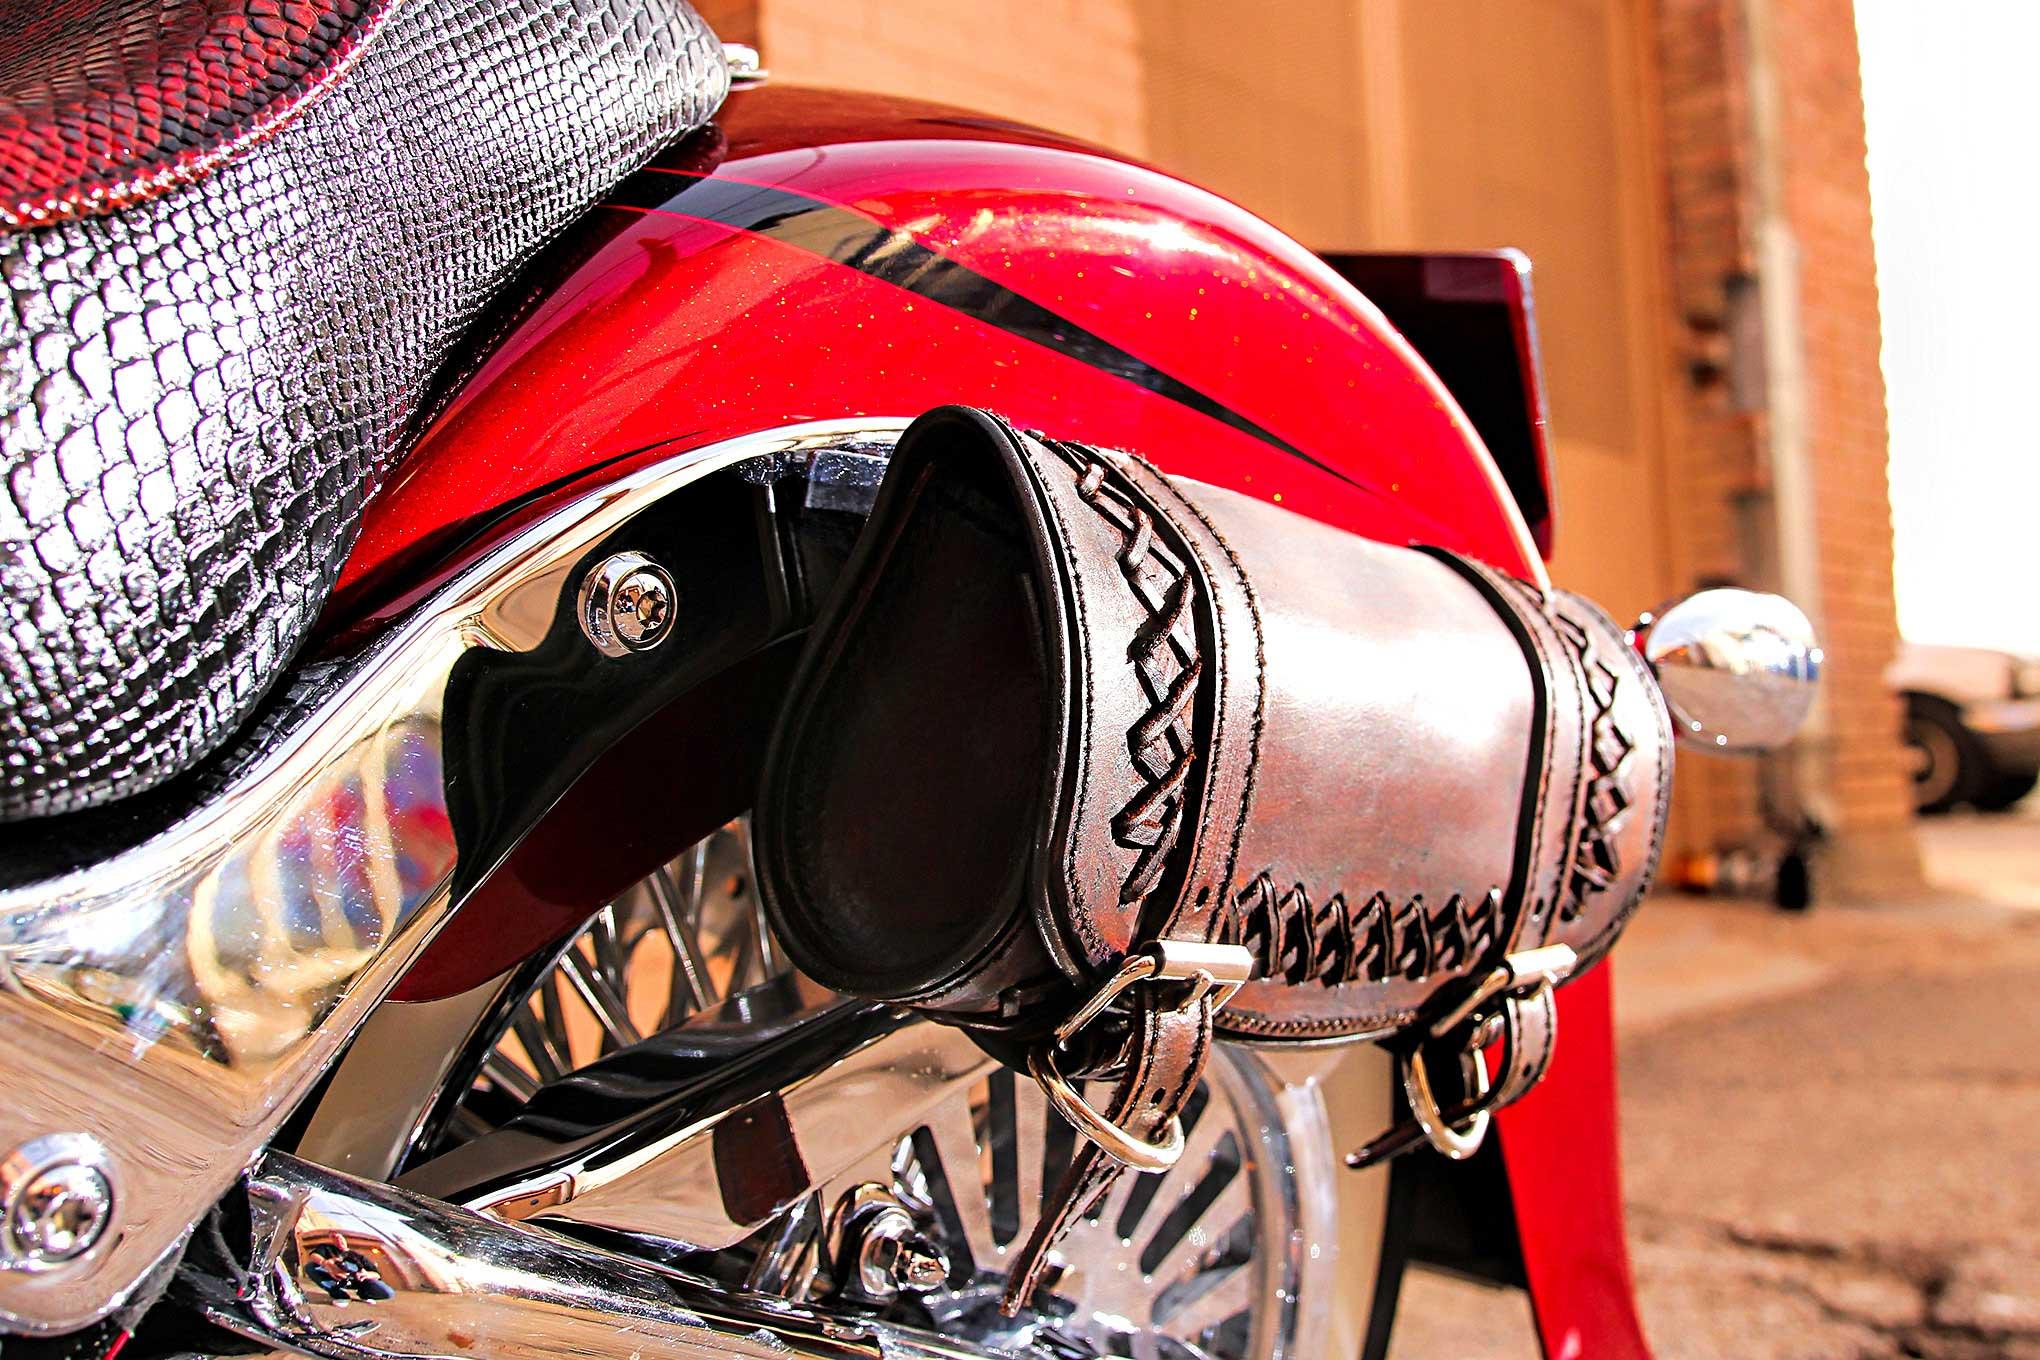 2009 Harley Davidson Fatboy Saddlebag - Lowrider